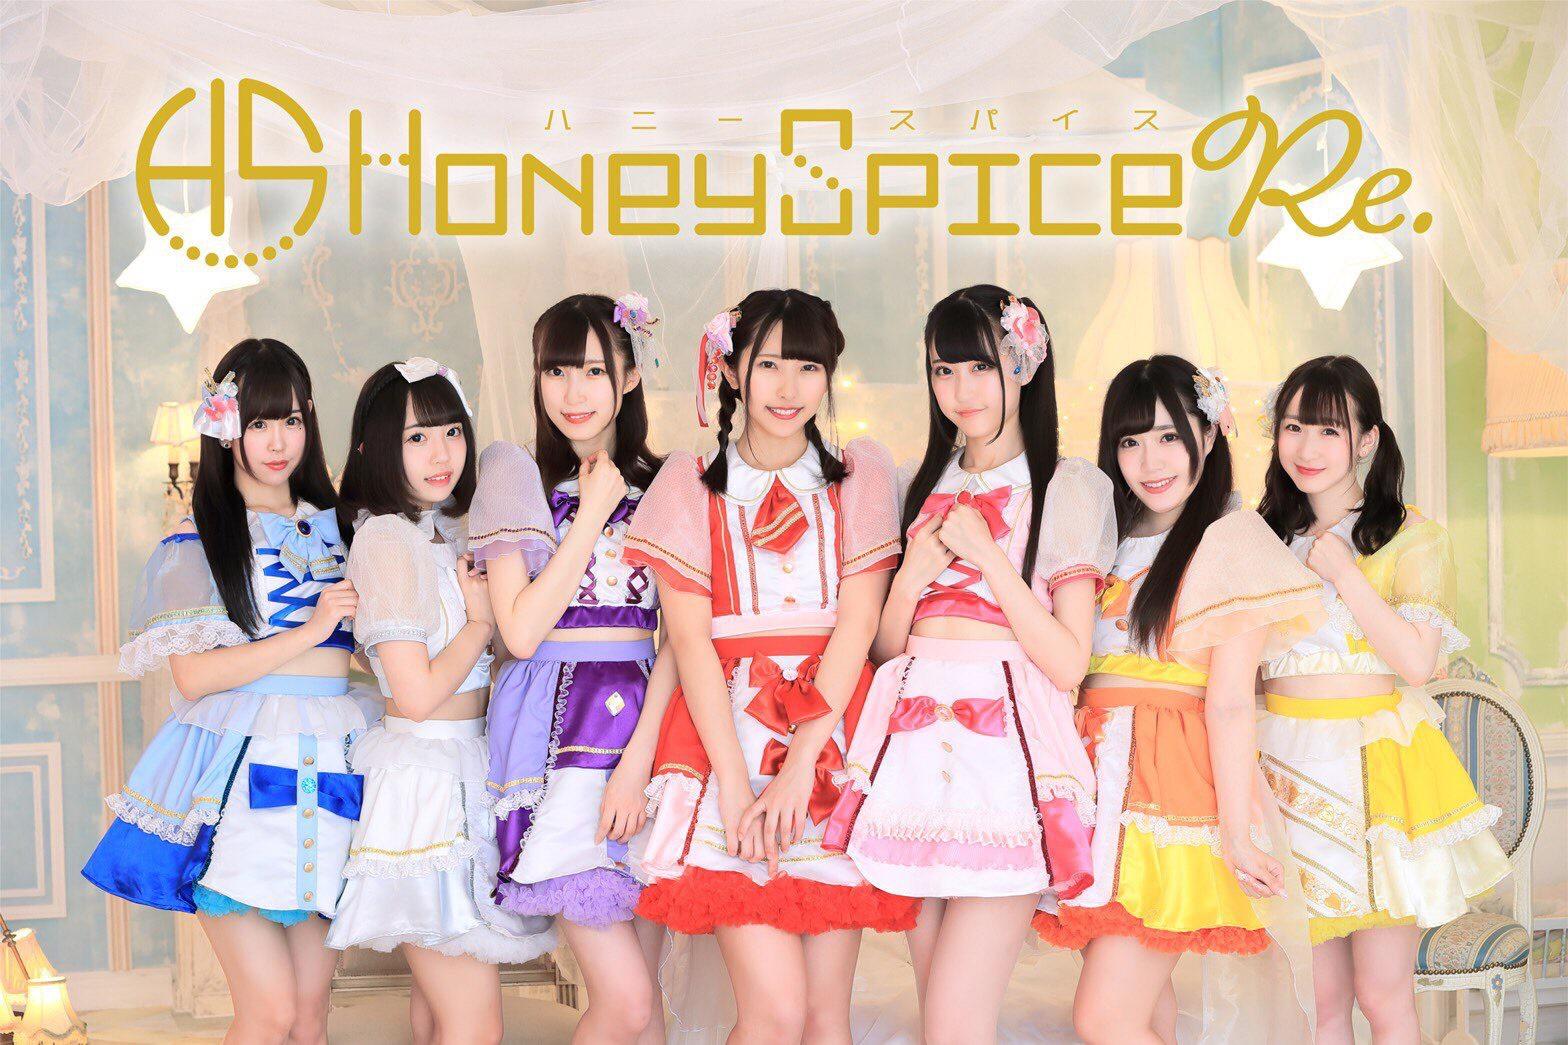 Honey Spice Re.